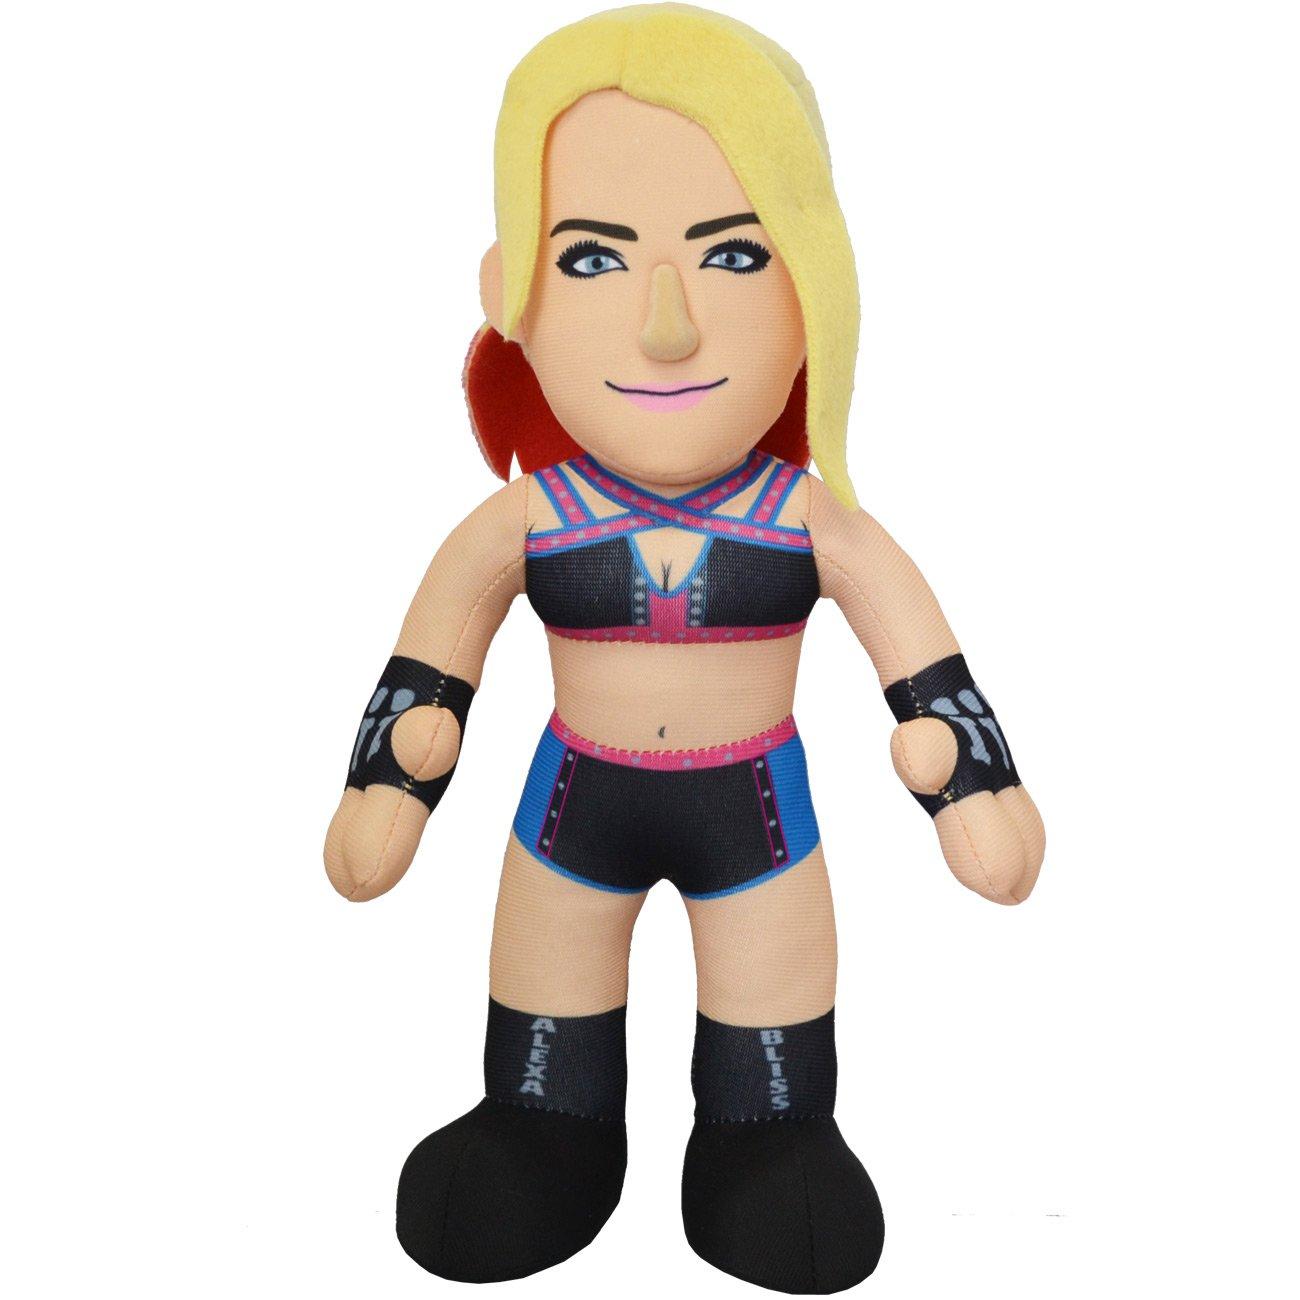 "WWE Braun Strowman 10"" Plush Figure"